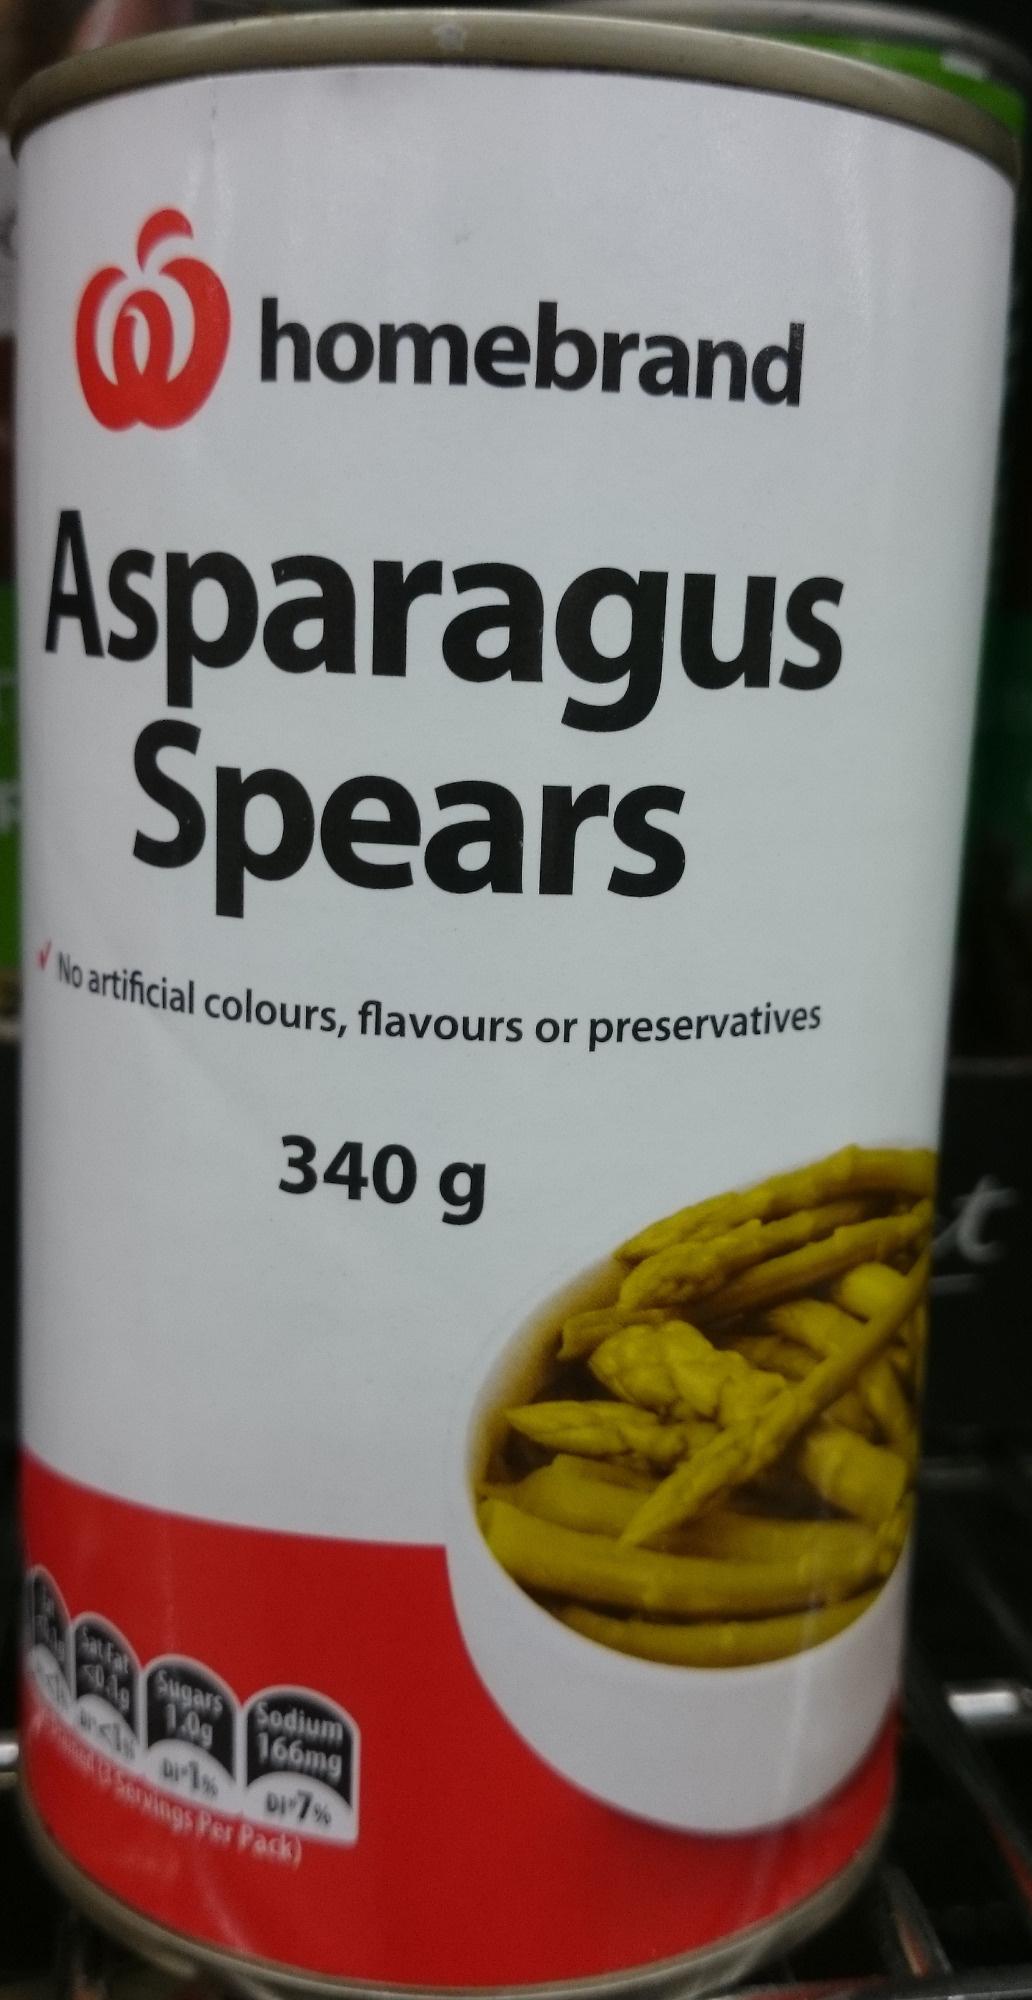 Homebrand Asparagus Spears - Product